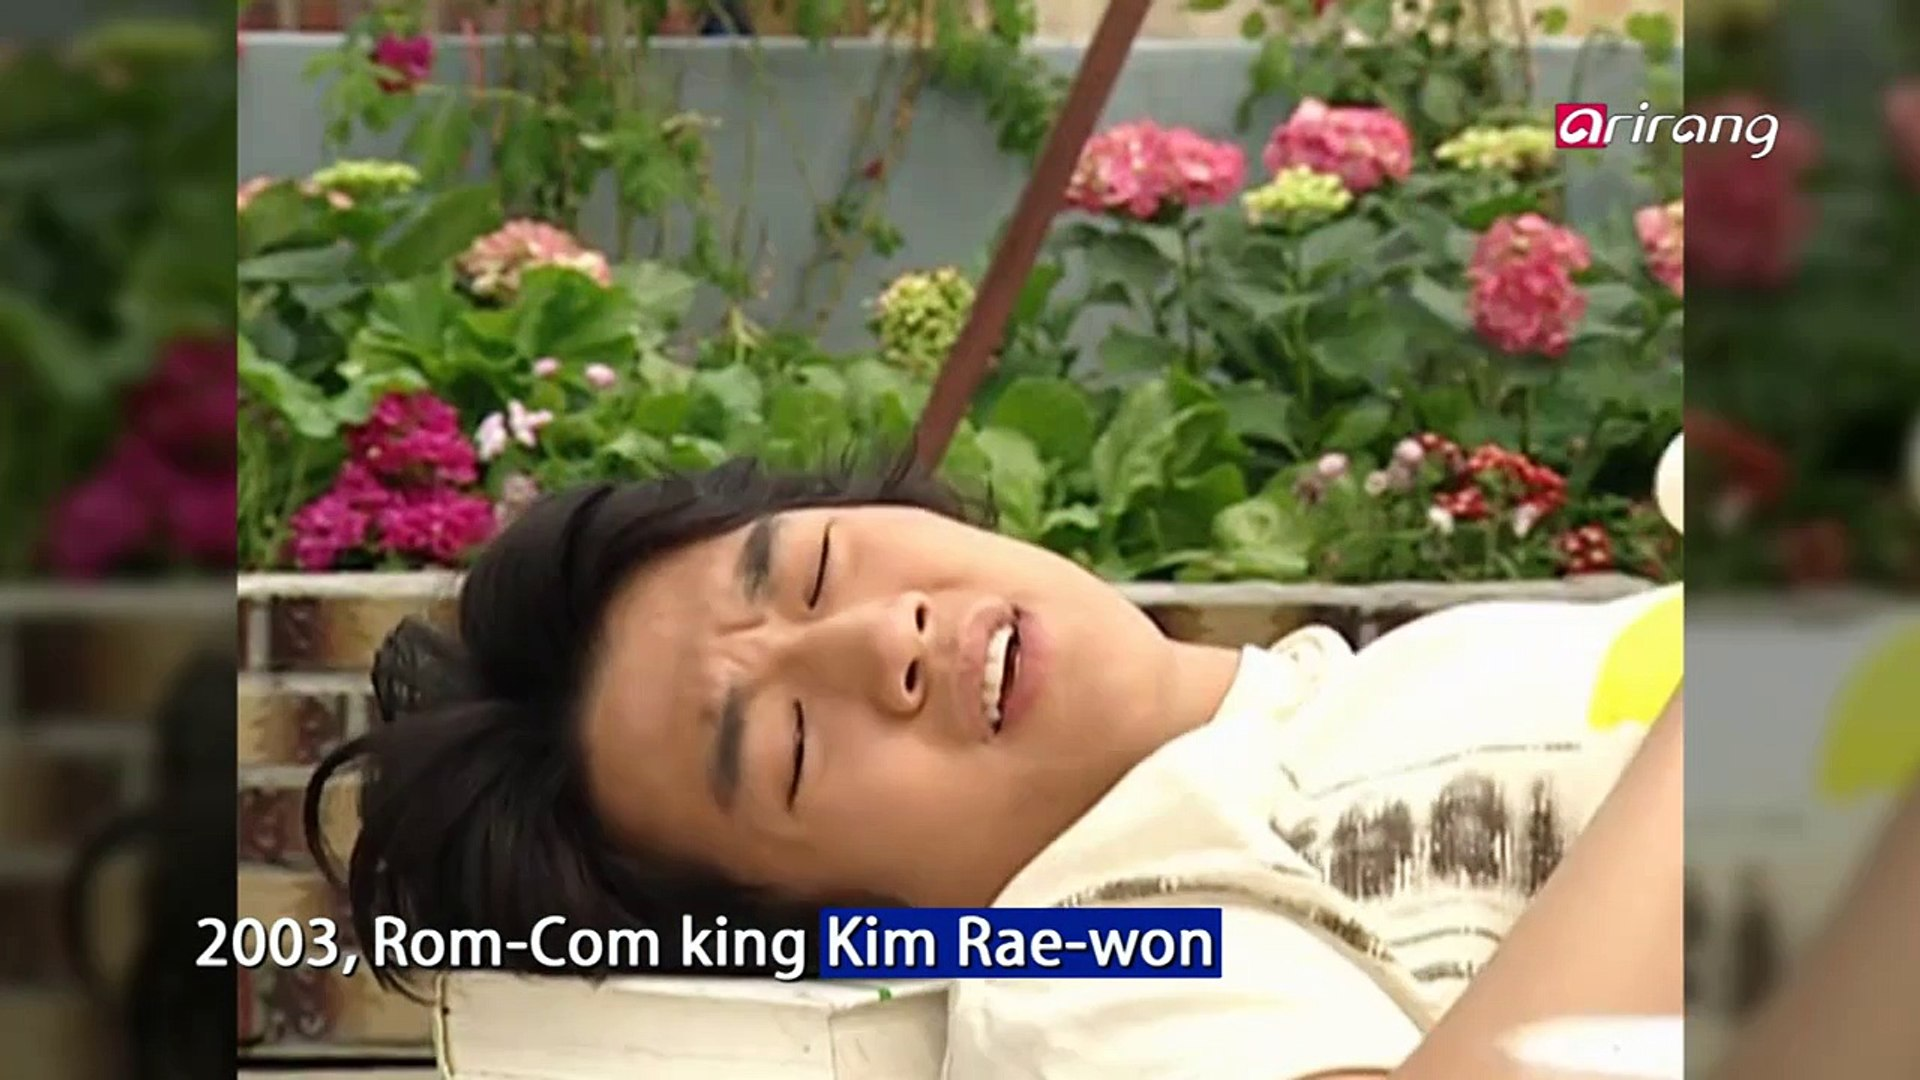 ACTOR KIM RAE-WON 배우 김래원